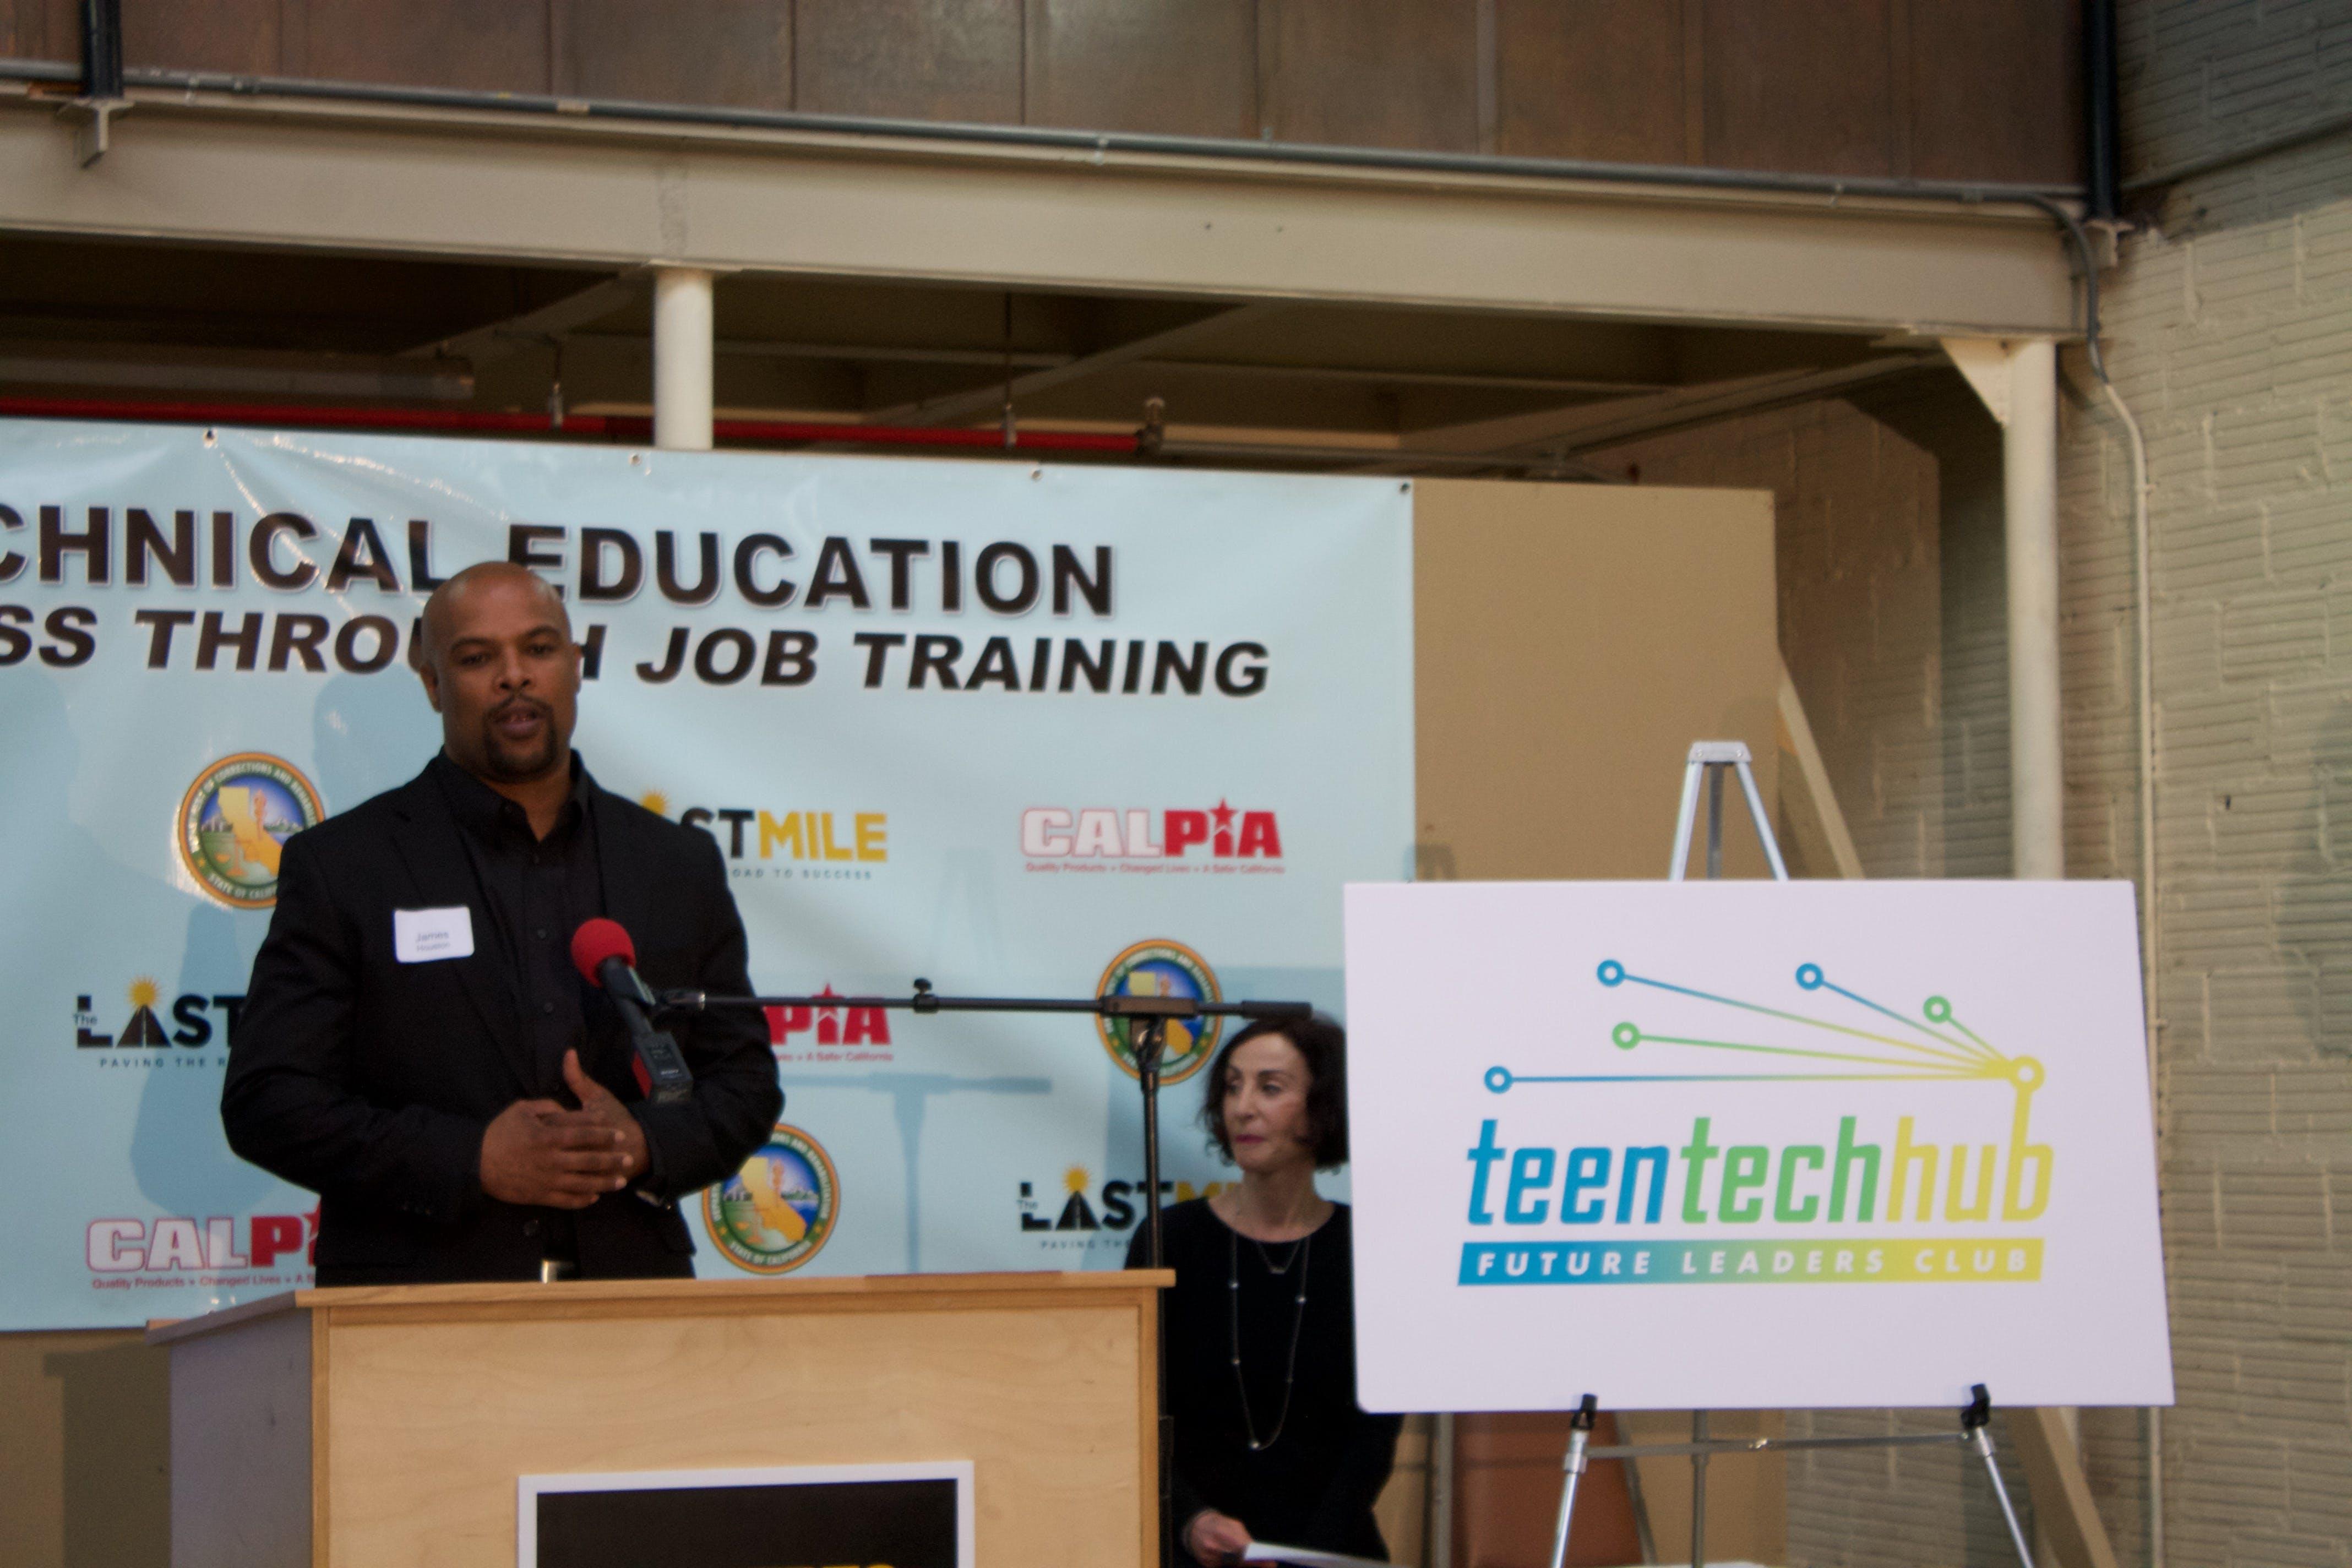 James Houston pitched Teen Tech Hub.